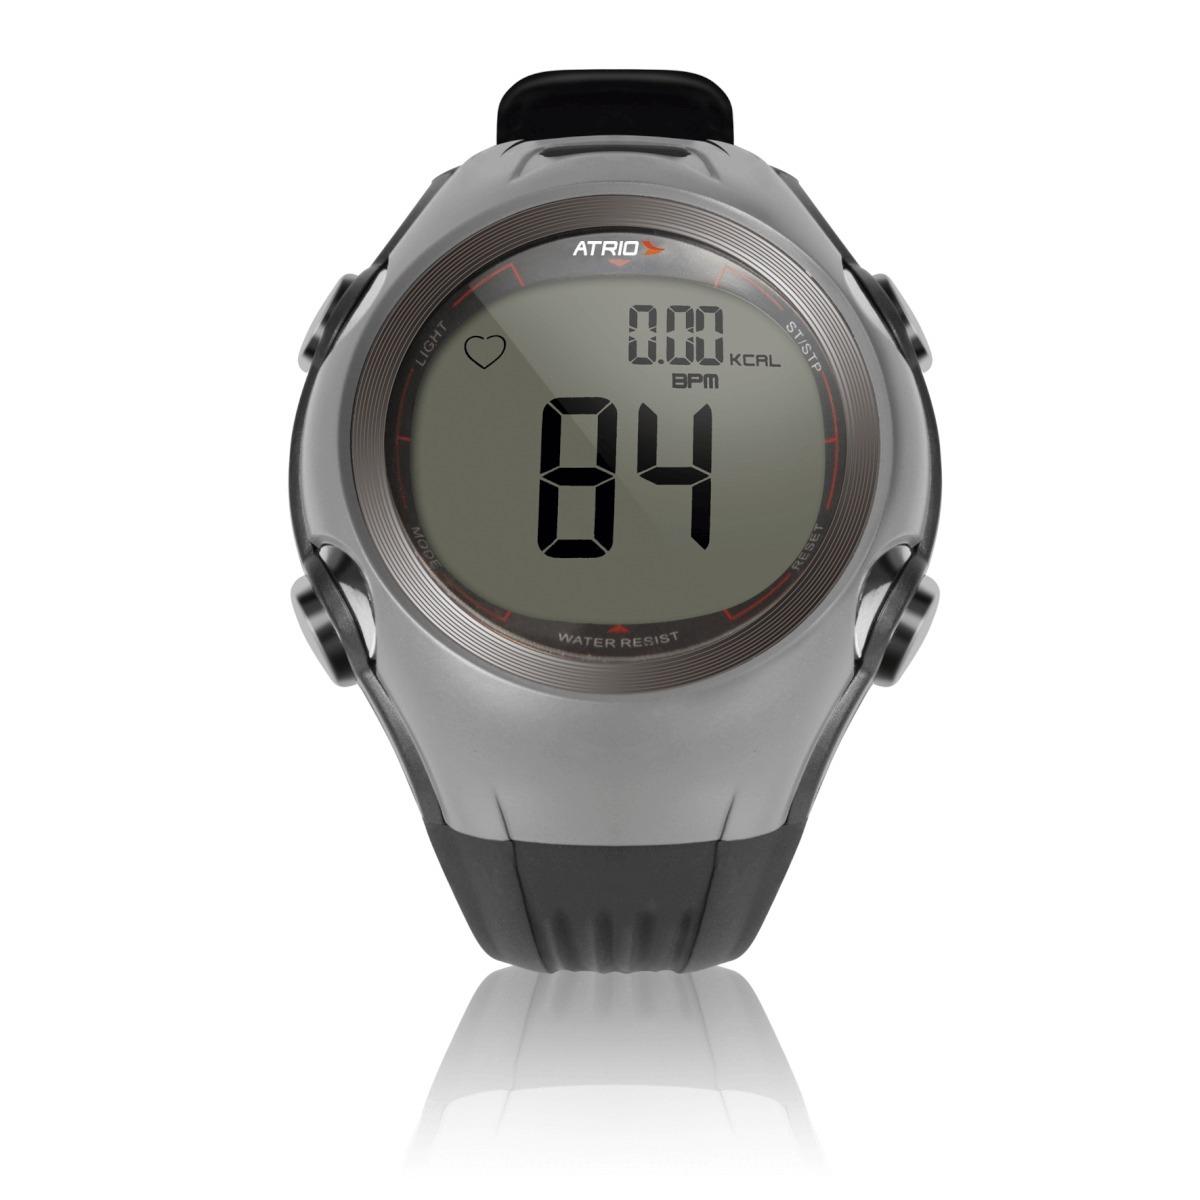 cf03175ac37 Relogio Monitor Cardiaco - Atrio - Hc008 - R  149